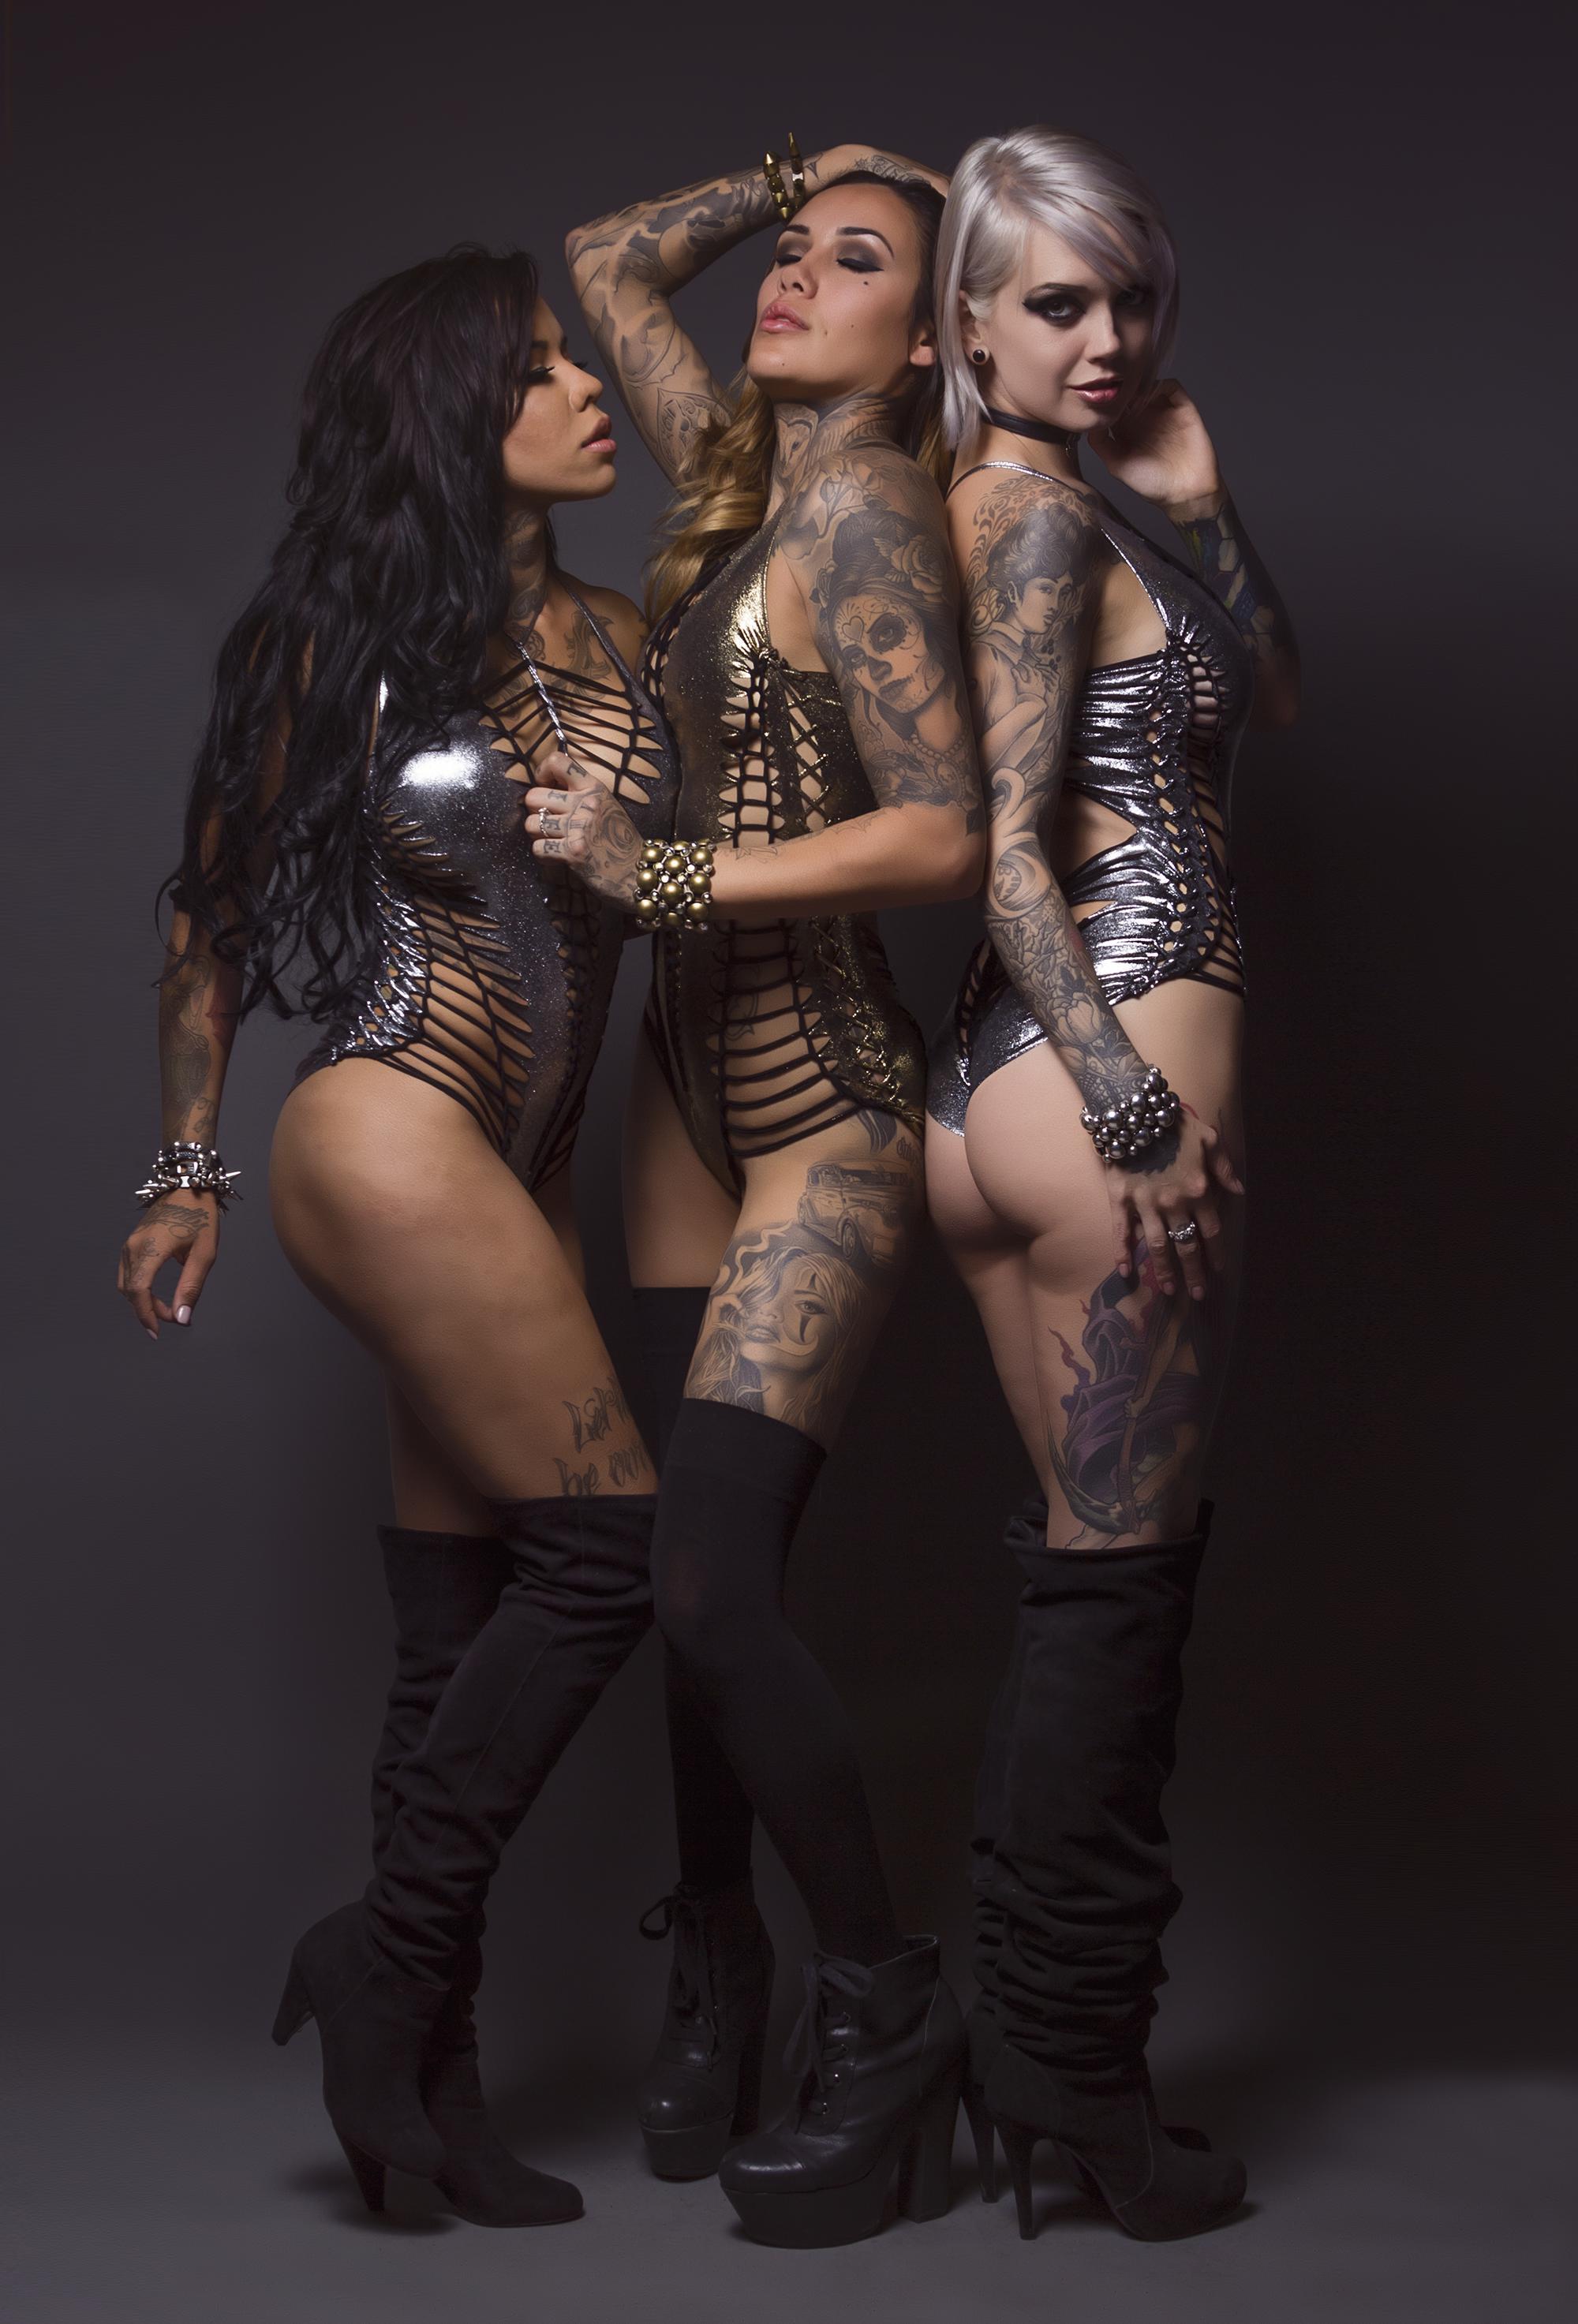 three inked fashion models in Peepshow Clothing bodysuits.